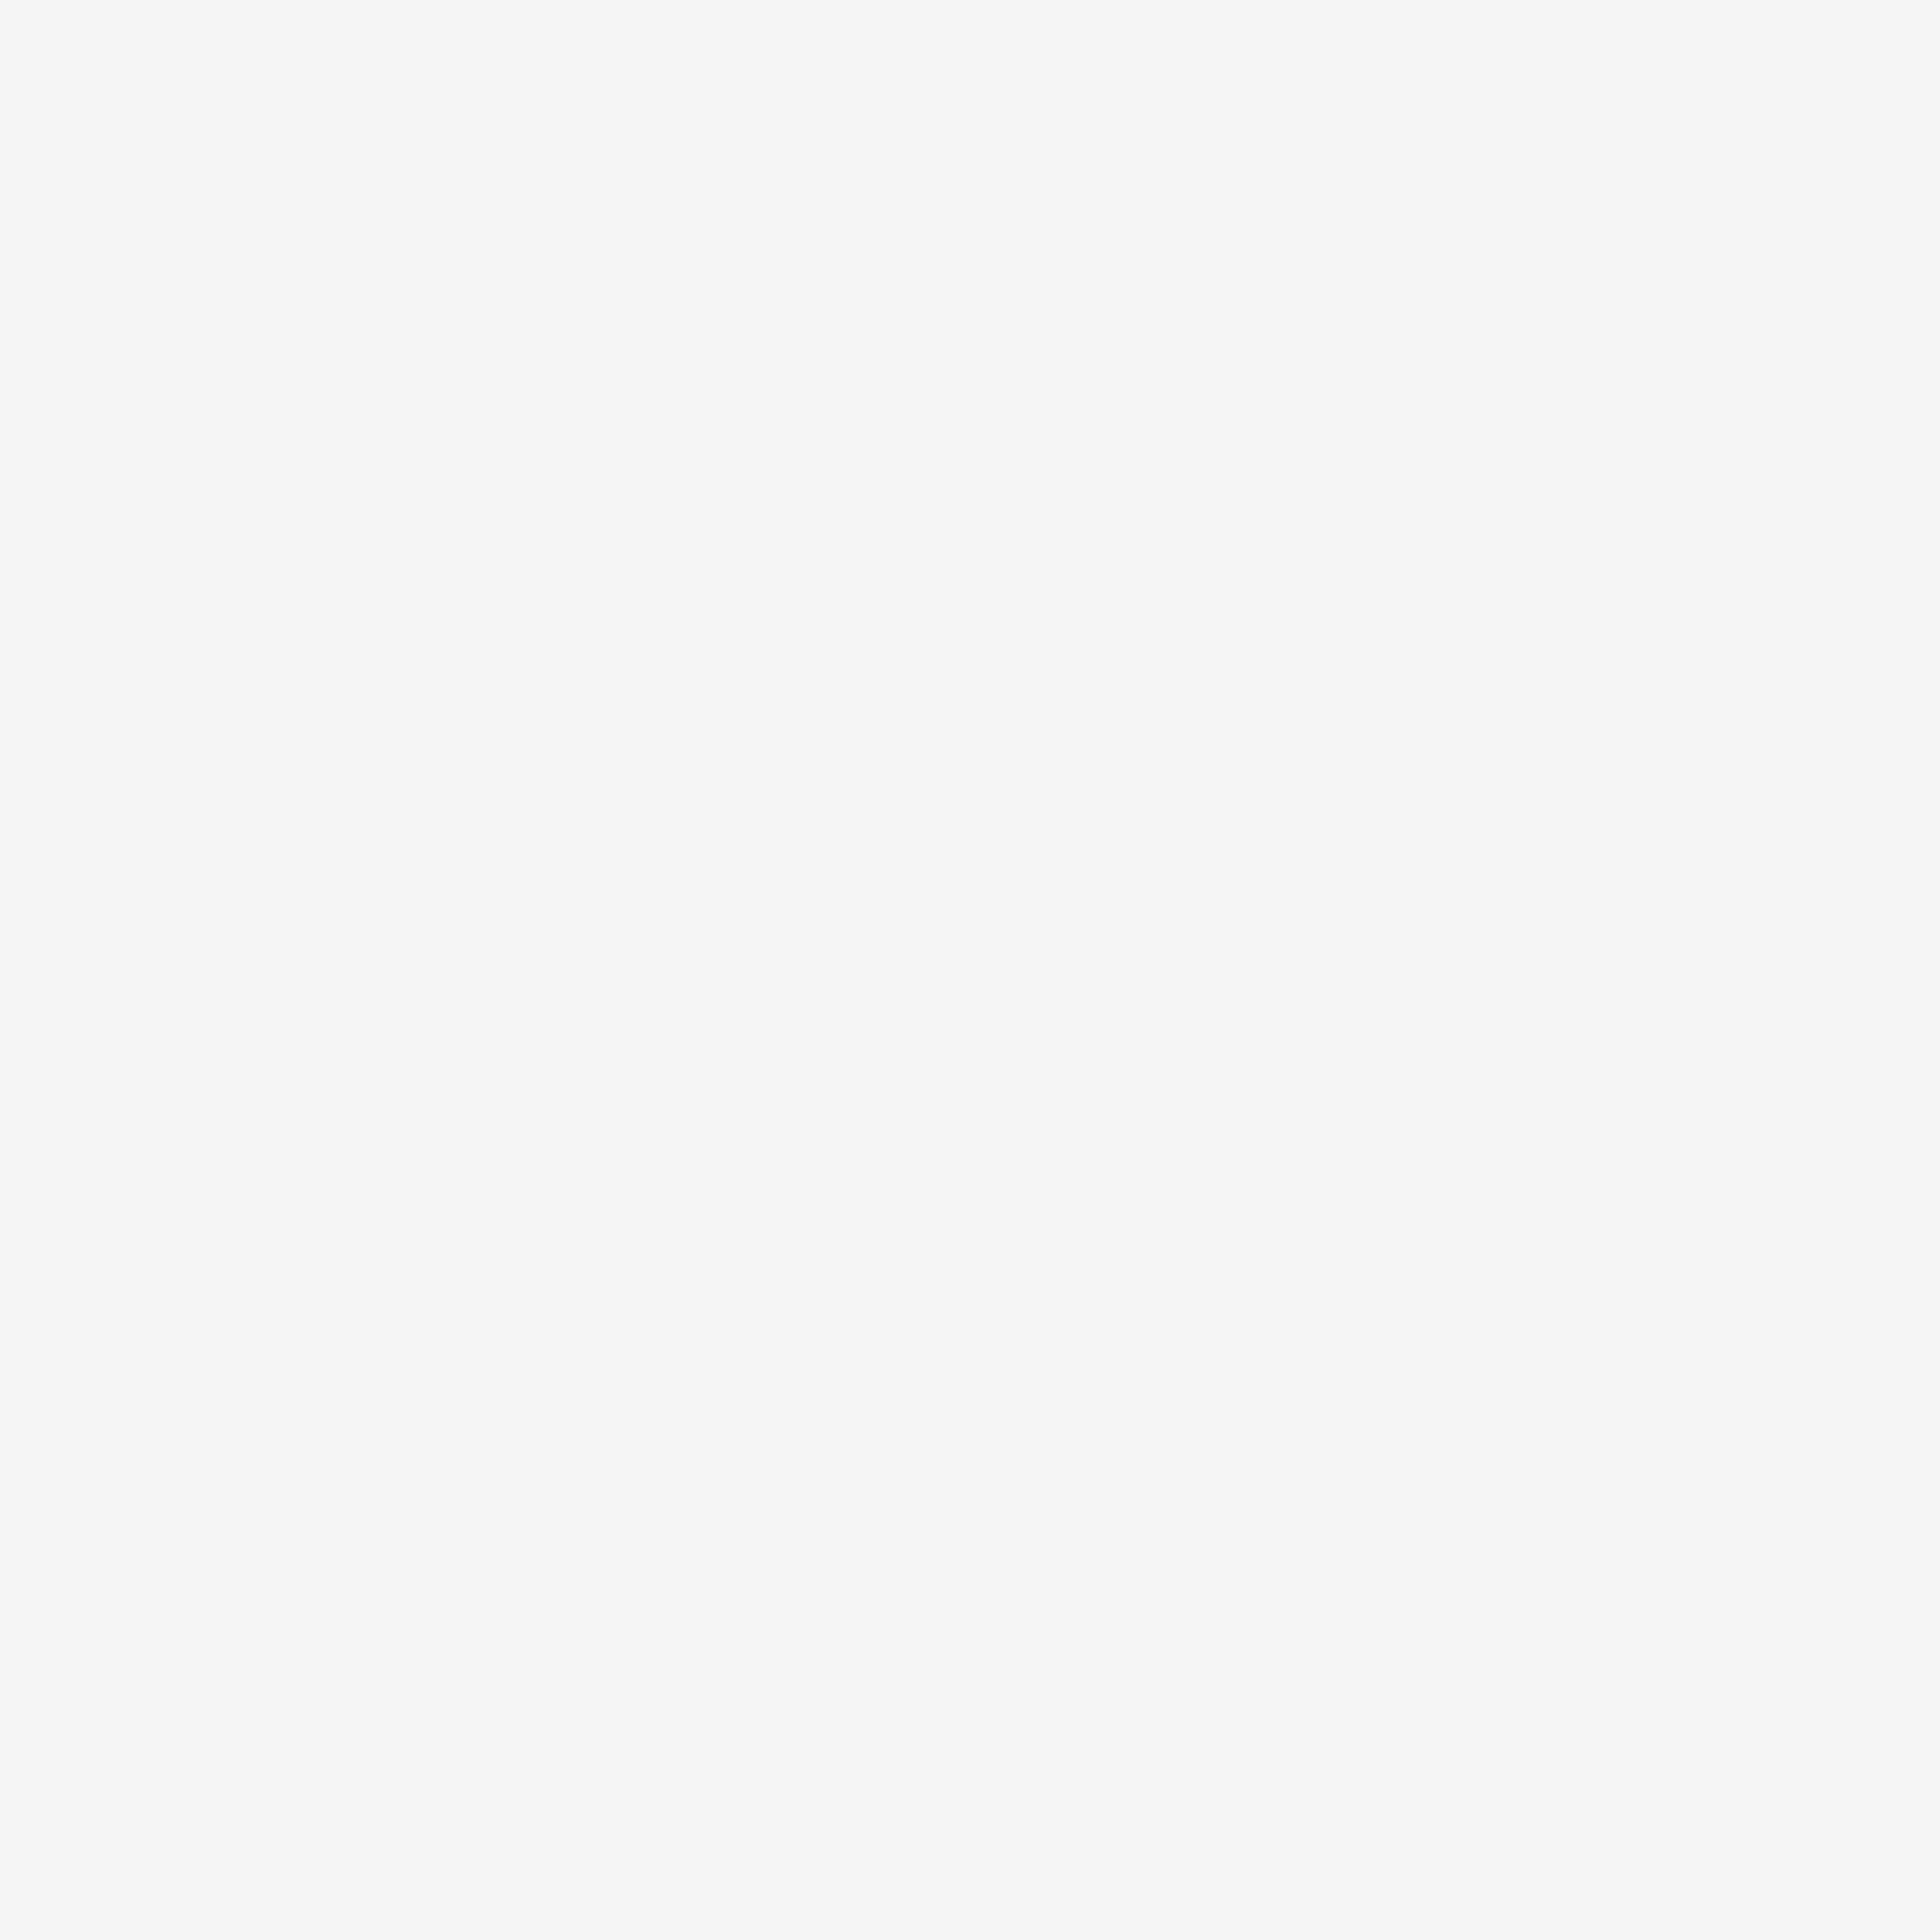 dccd815c9c8 Adidas WK Bal 2018 Official Game Ball - Ballen - Accessoires ...